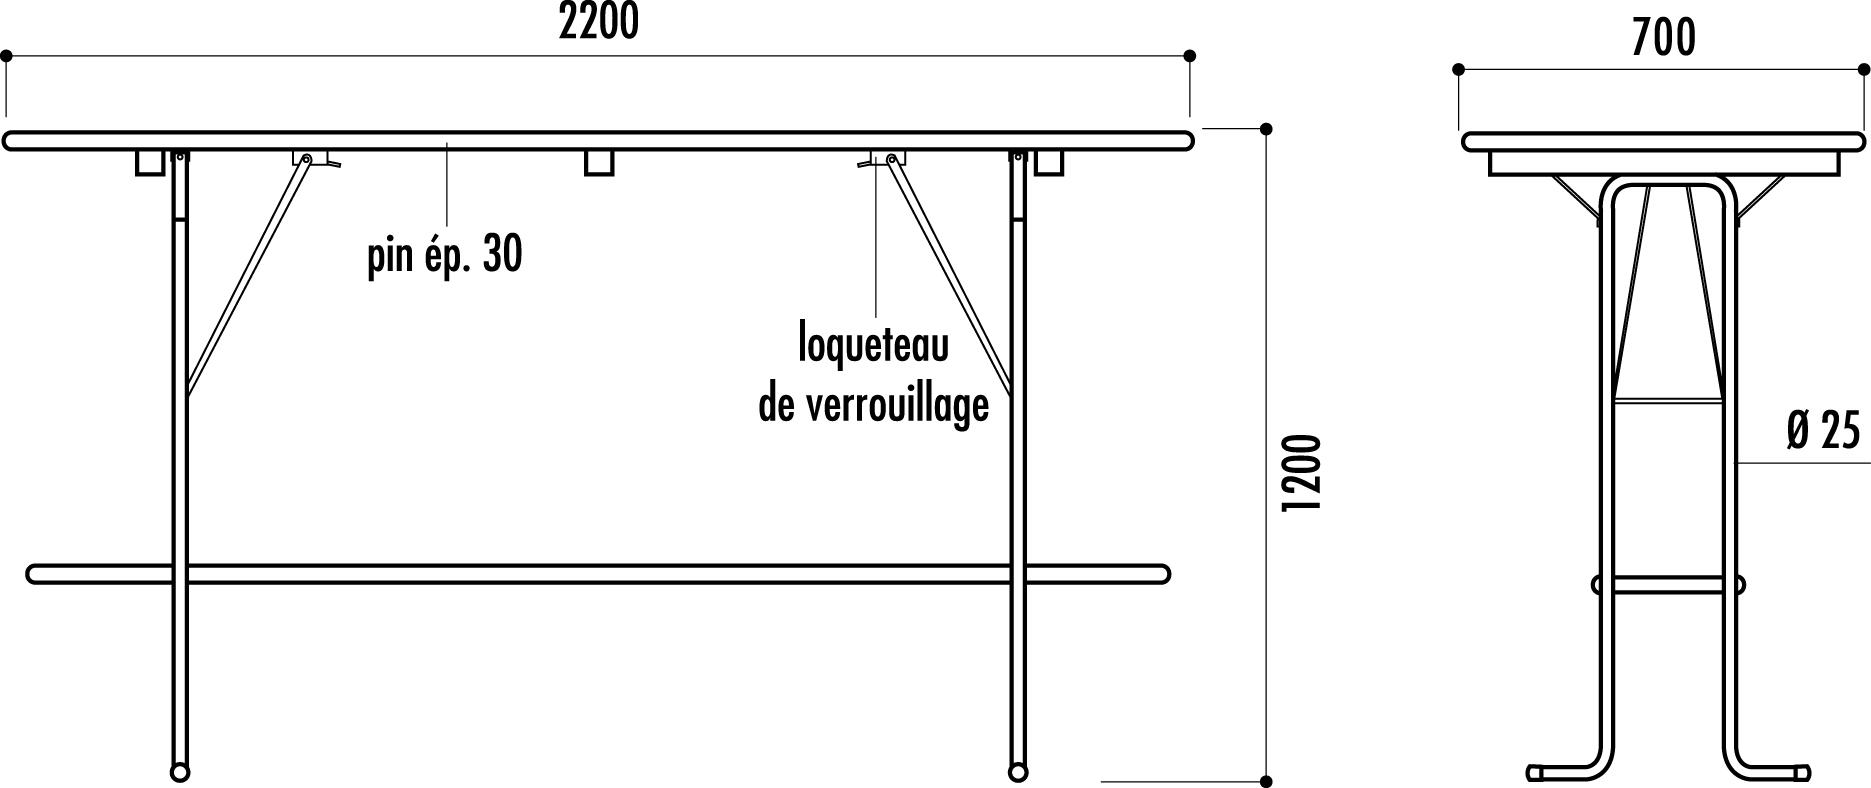 table mange debout menuiserie bertin. Black Bedroom Furniture Sets. Home Design Ideas